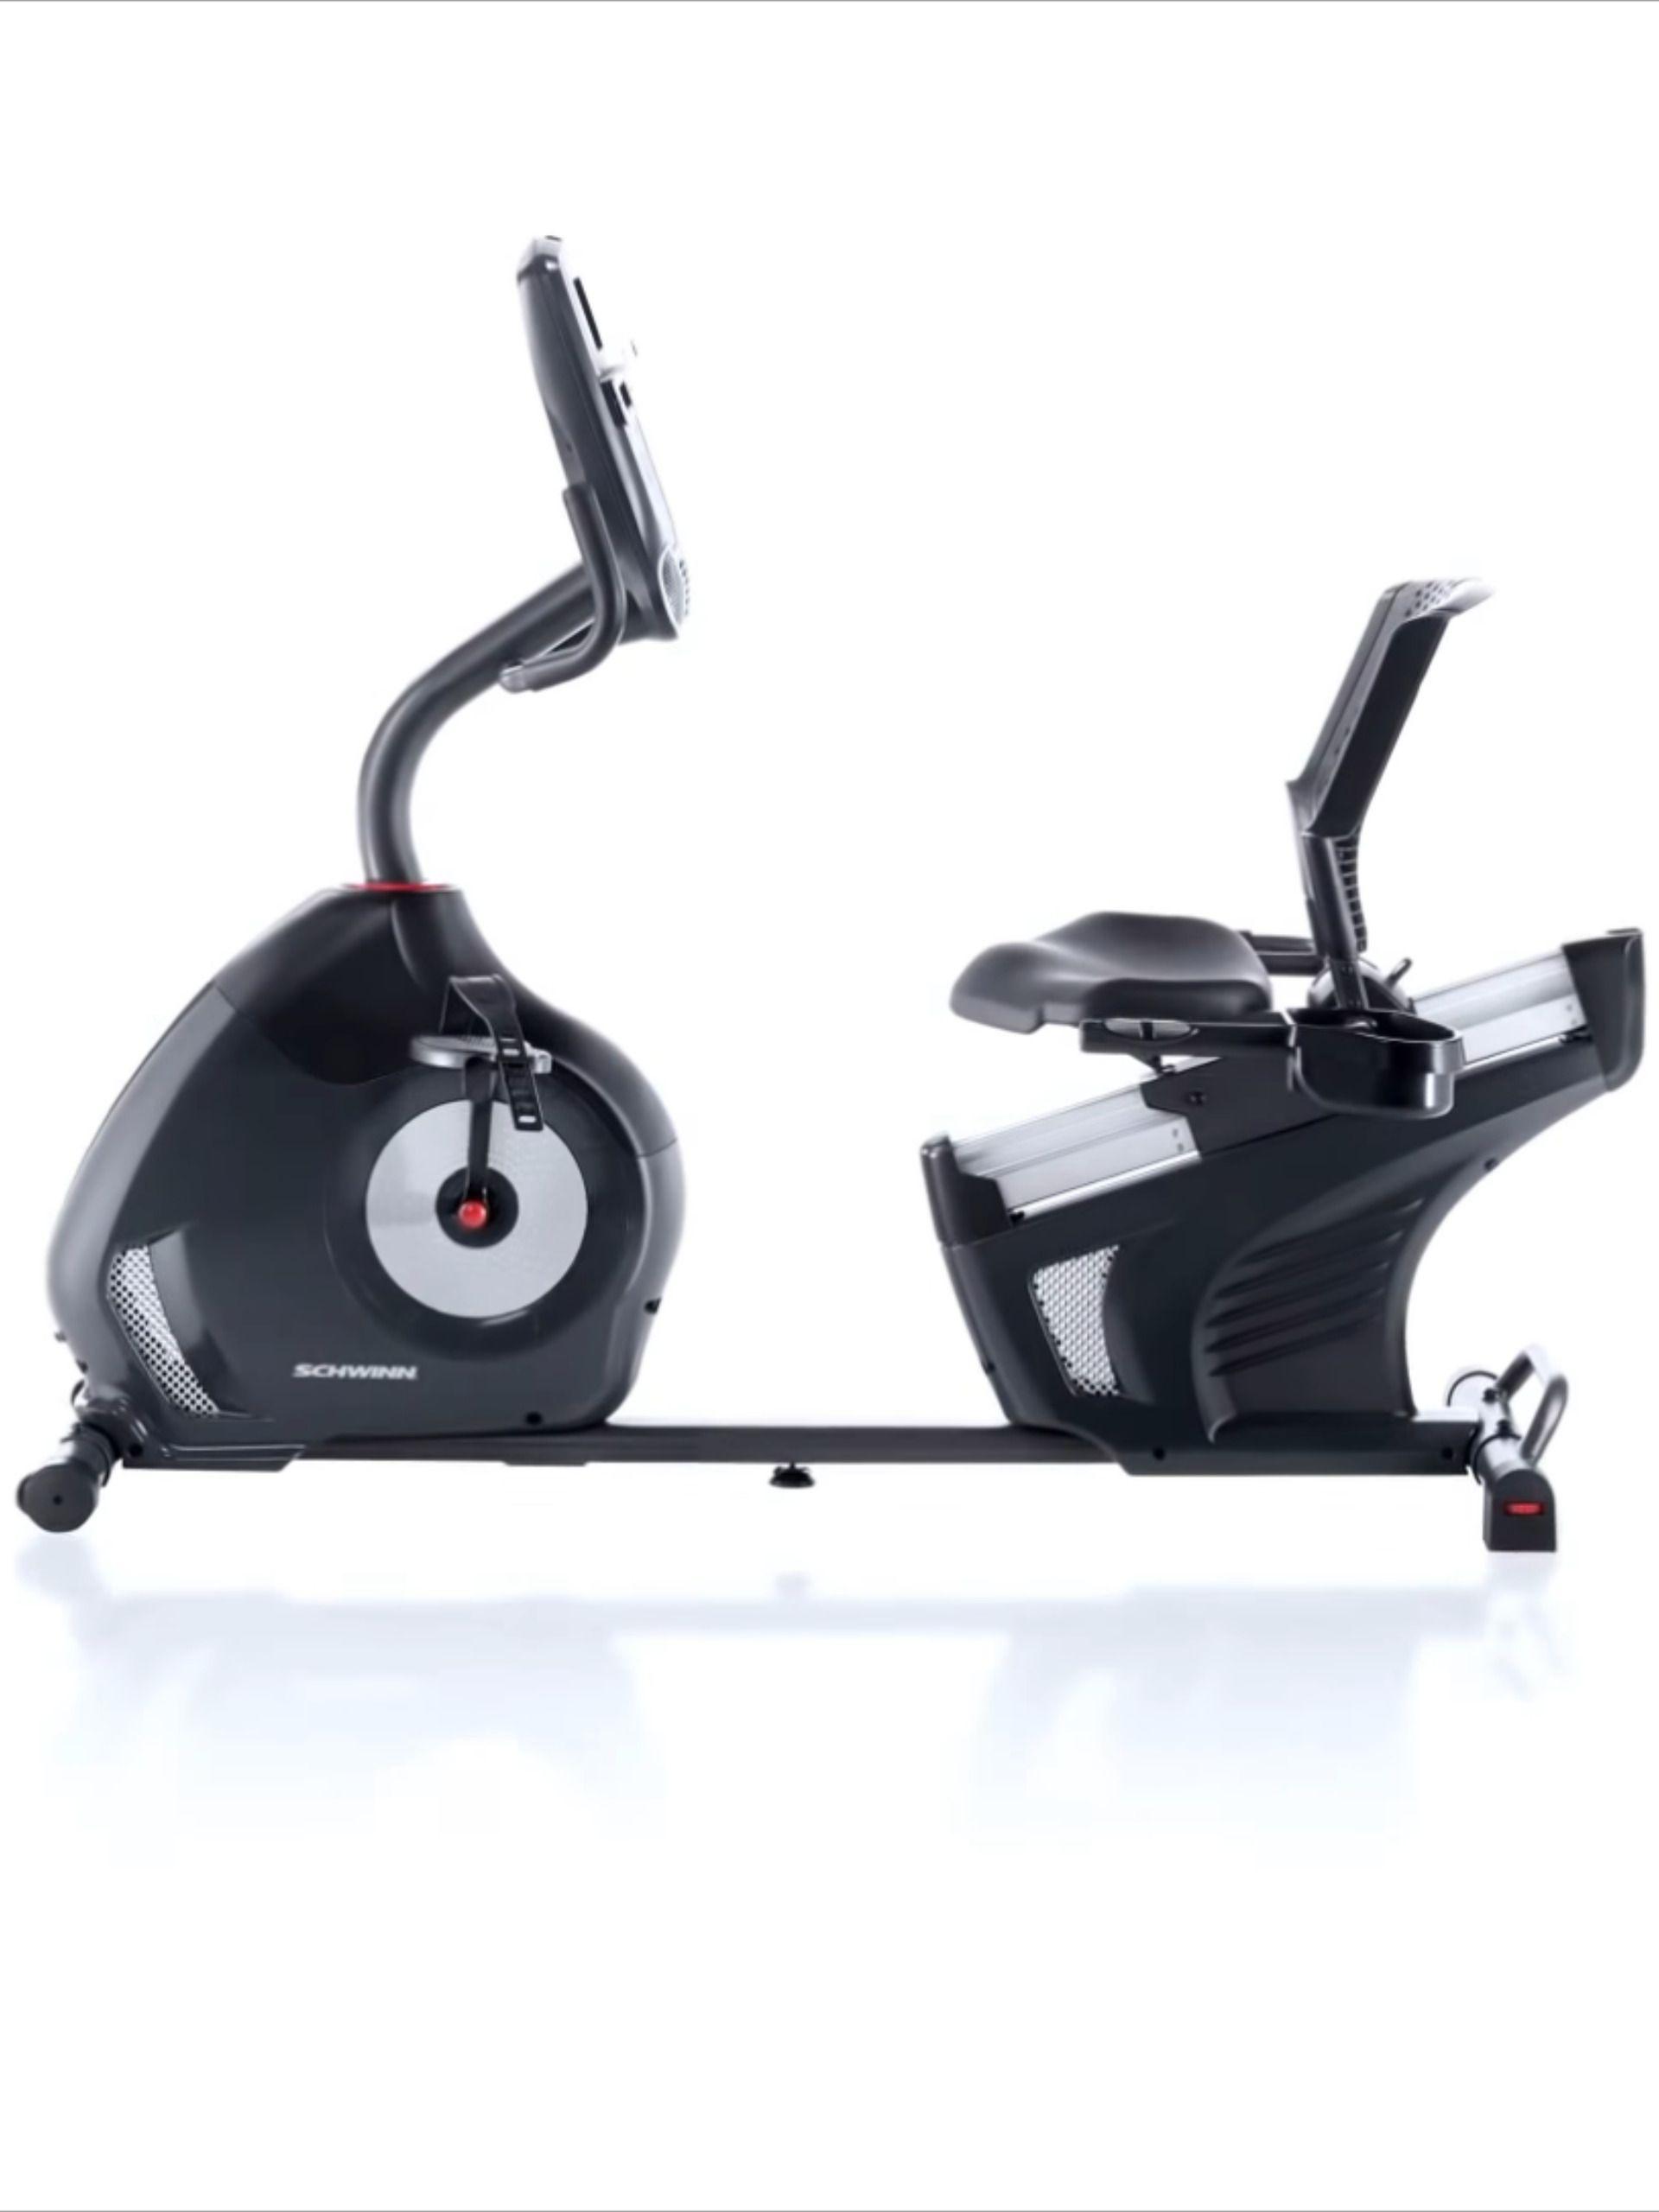 Treadmill Vs Stationary Bike Weslo Recumbent Bikes Recumbent